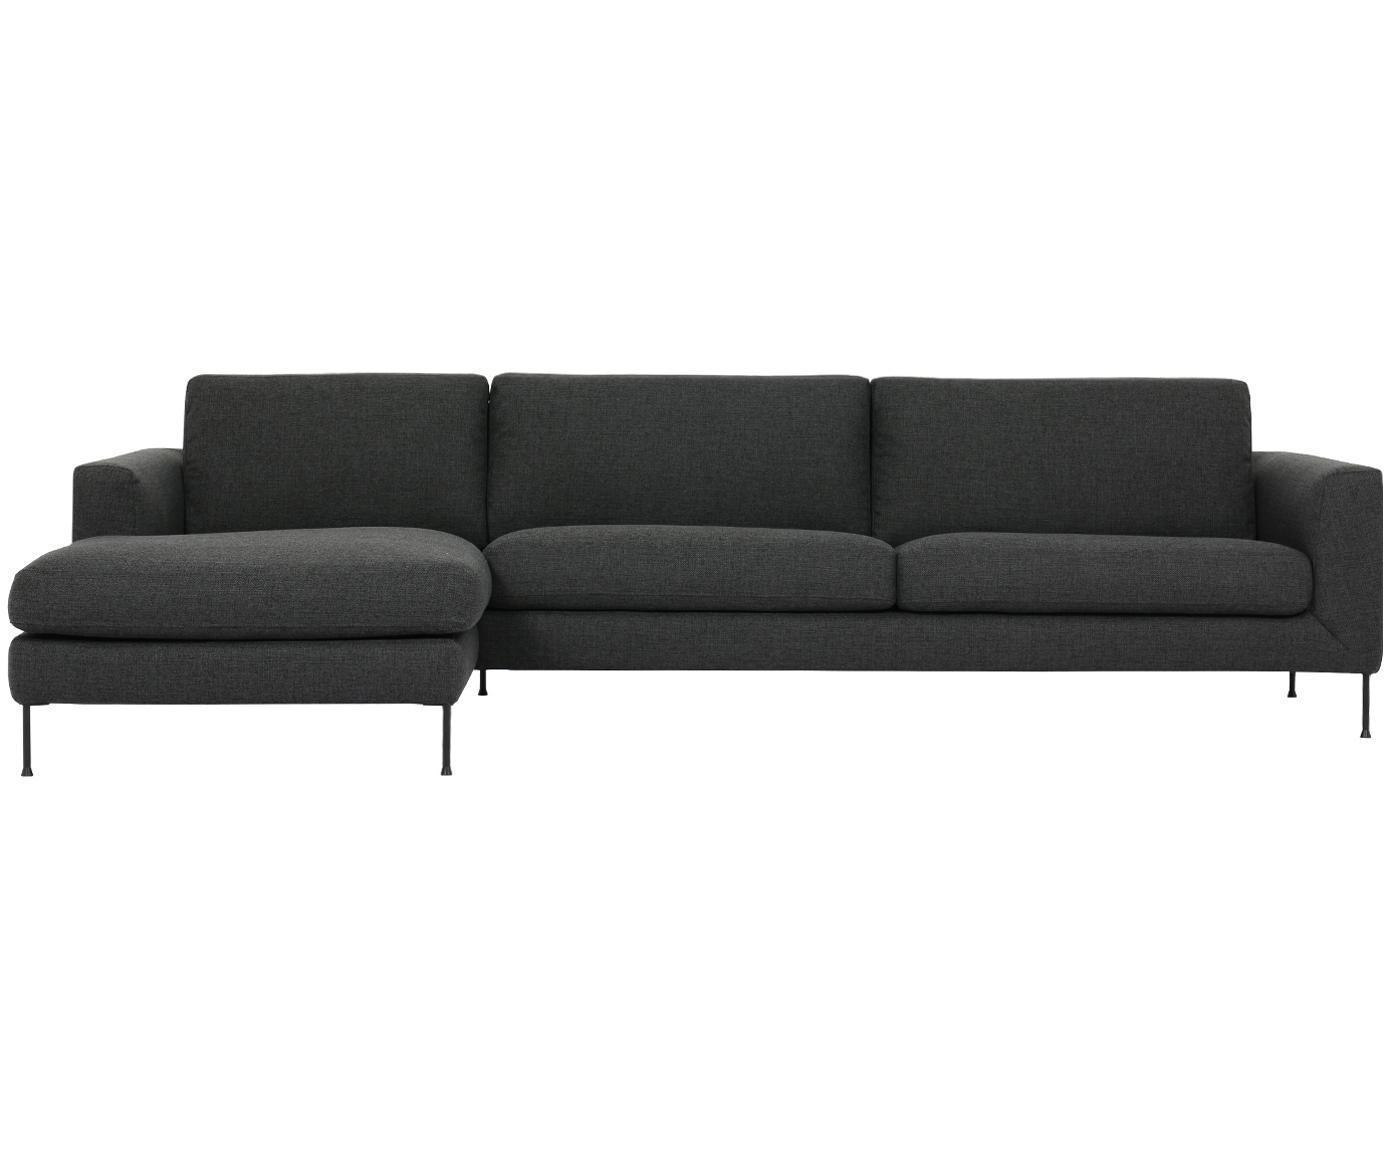 Ecksofa Cucita (4-Sitzer), Bezug: Webstoff (Polyester) 45.0, Gestell: Massives Kiefernholz, Webstoff Anthrazit, B 302 x T 163 cm